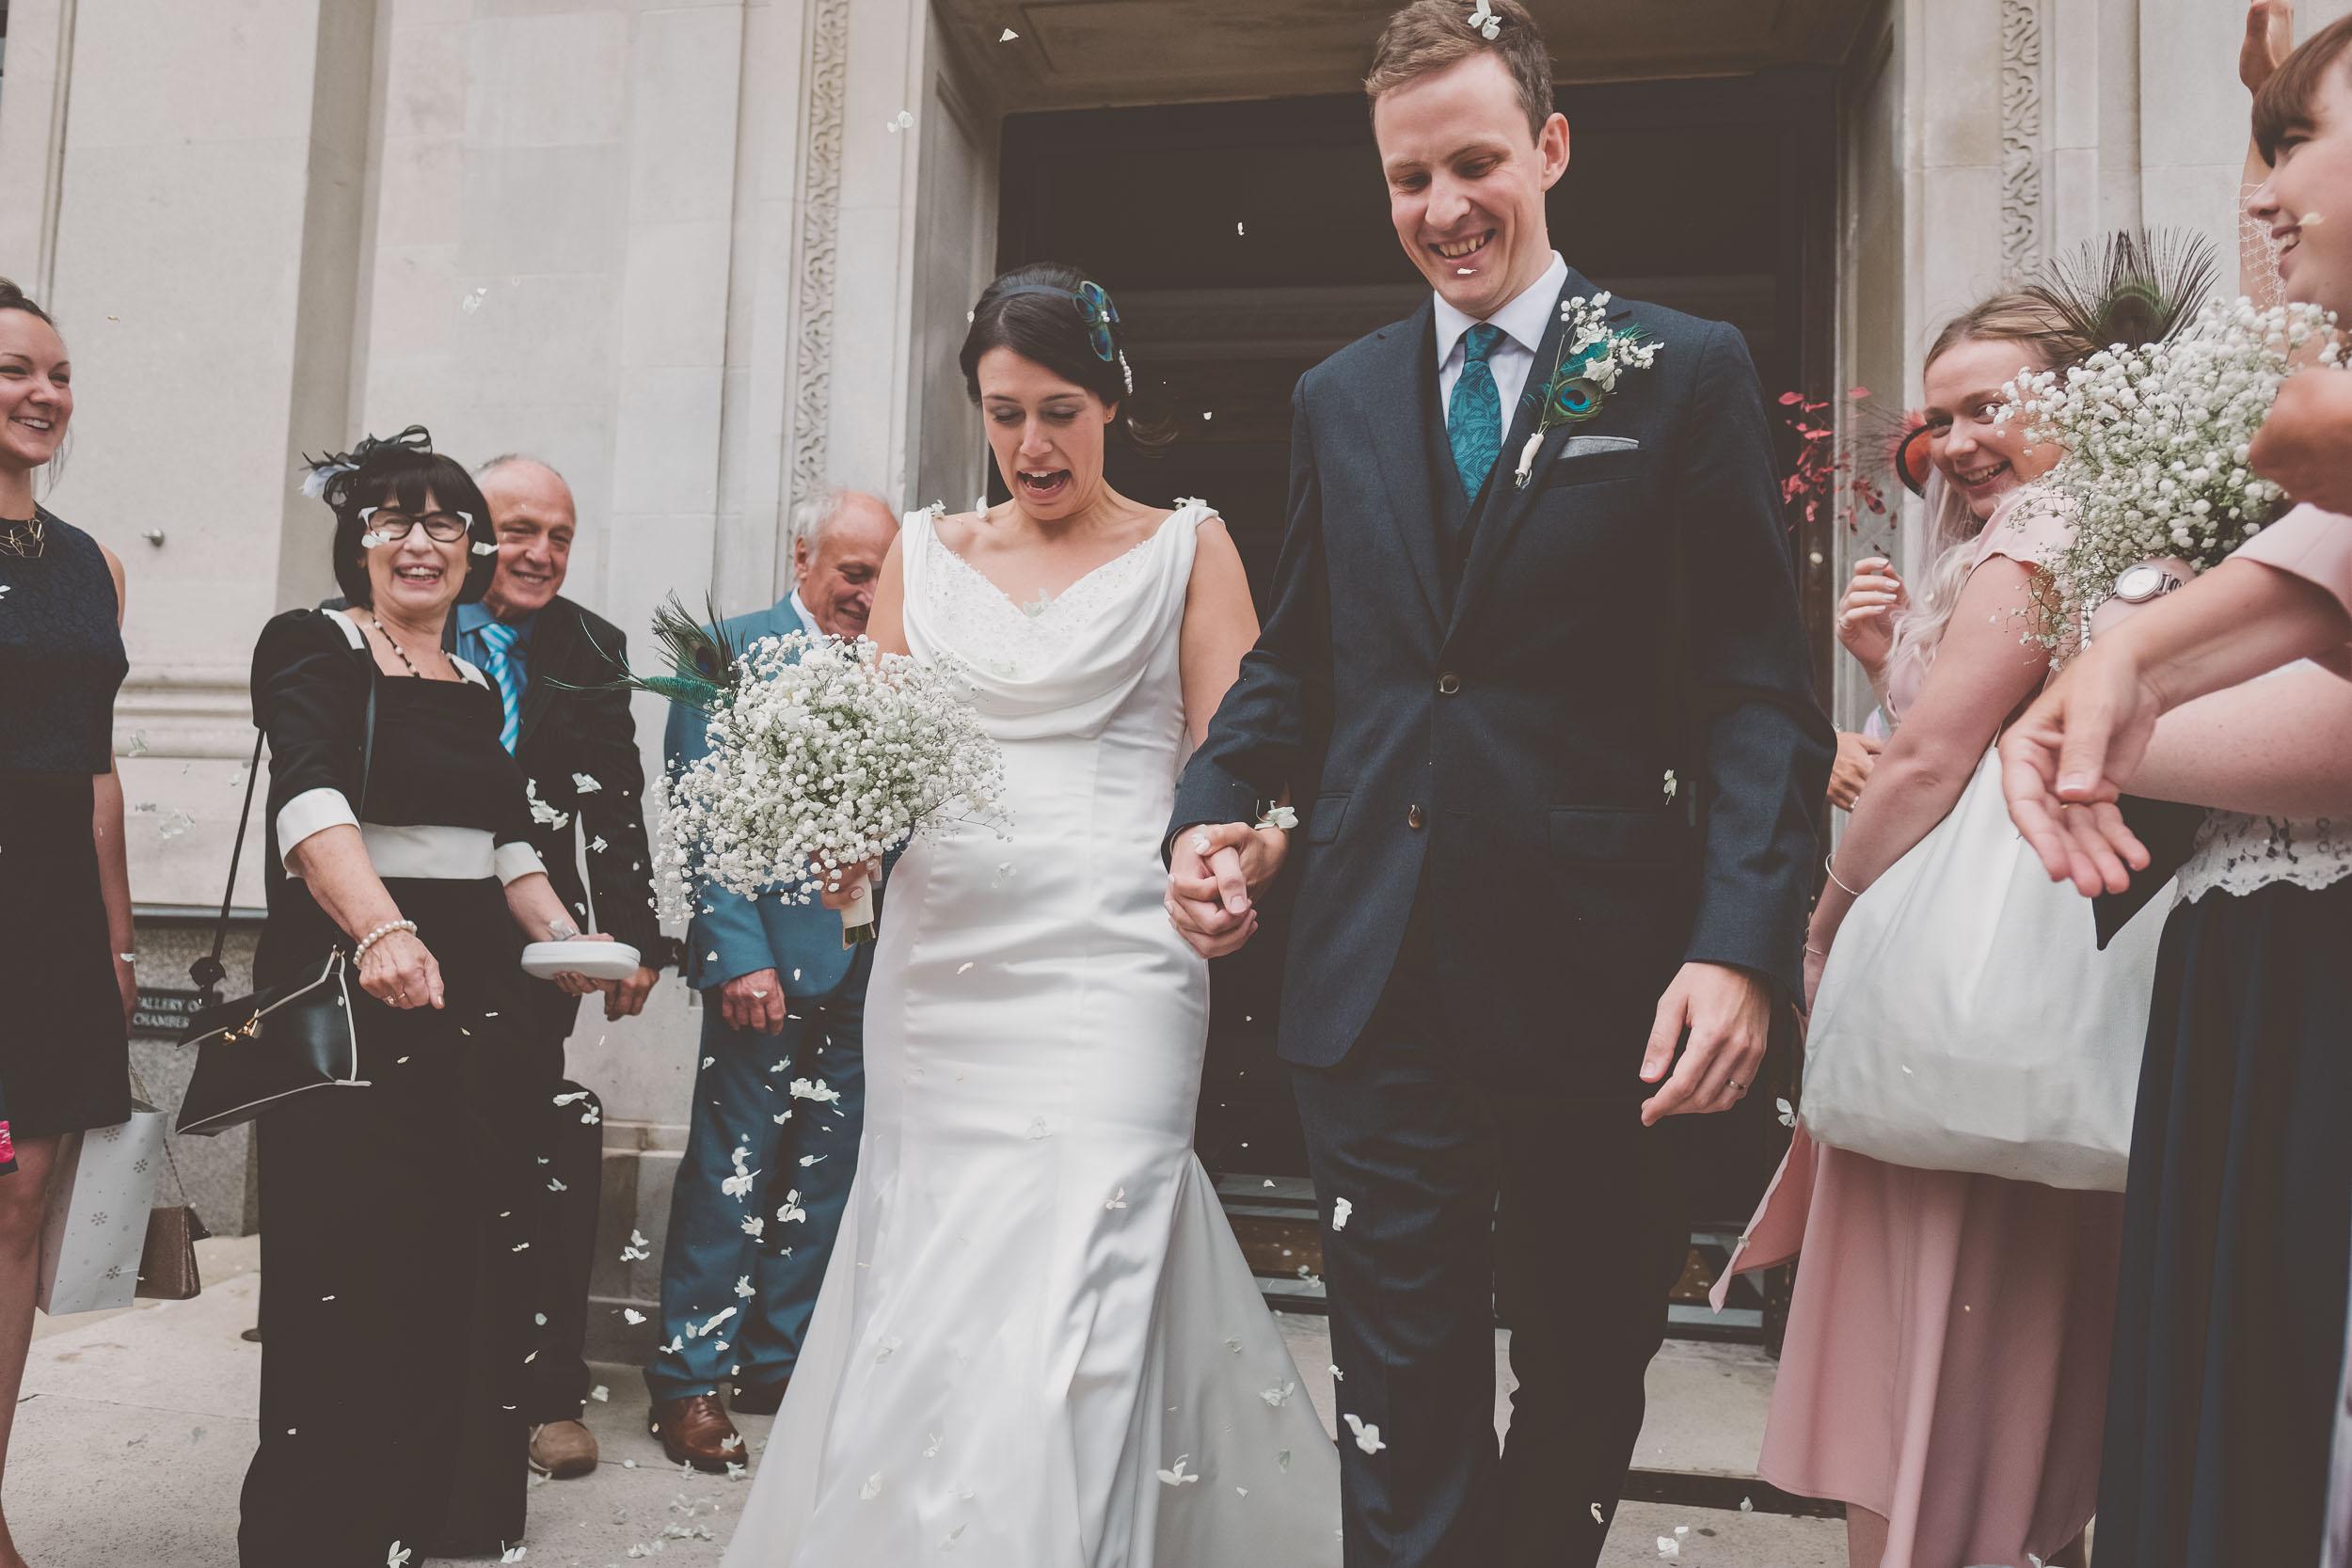 islington-town-hall-4th-floor-studios-wedding148.jpg